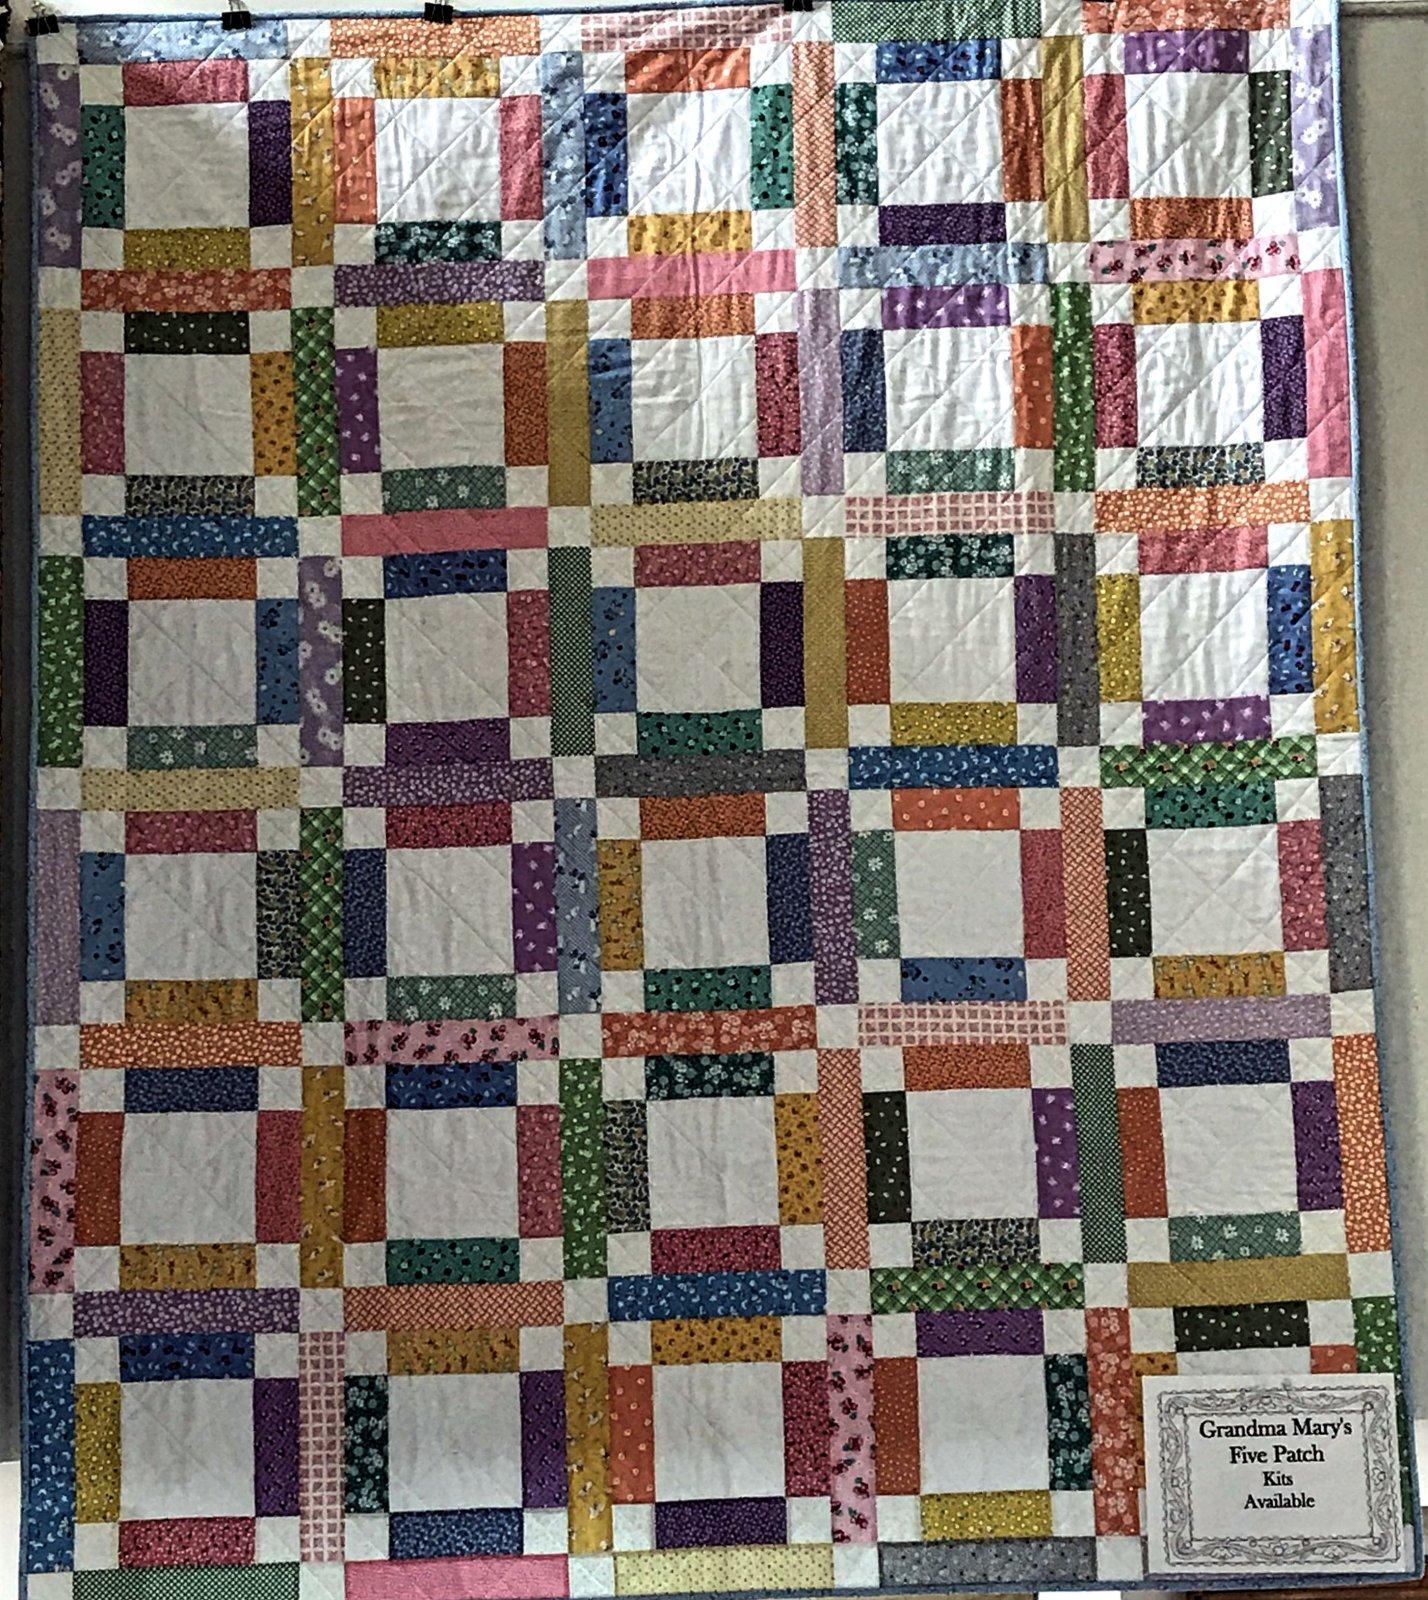 Grandma Mary's Five Patch Kit